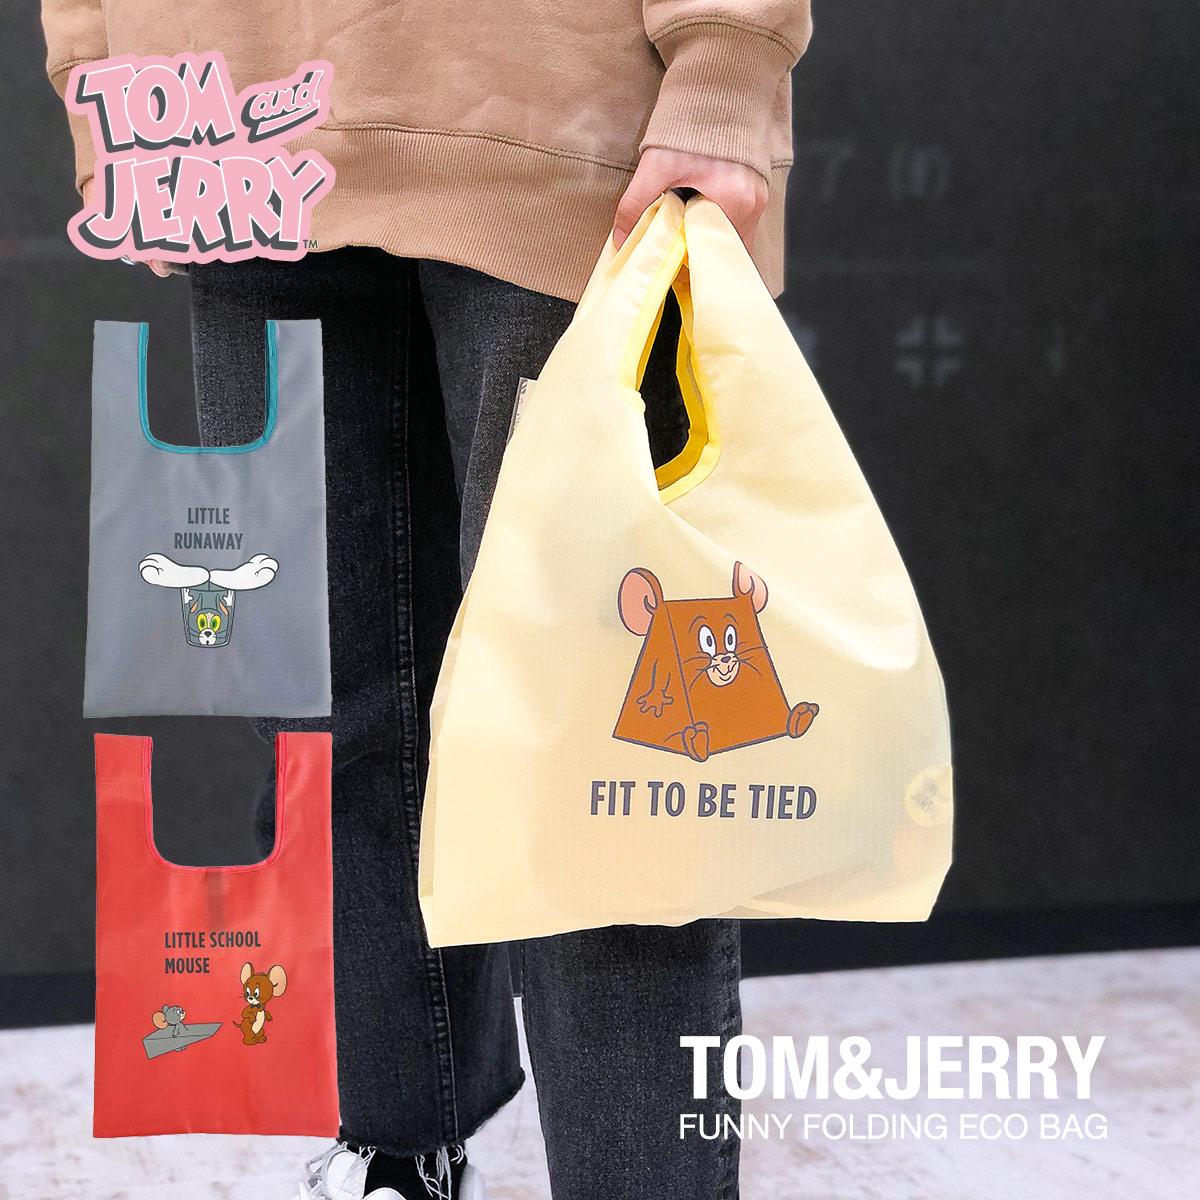 TOMandJERRY ファニー折りたたみエコバッグ 上等 エコバッグ バッグ 人気ショップが最安値挑戦 レディース キャラクター トムとジェリー 折りたたみ ショルダーバッグ 送料無料 大人 コンビニ スーパー メール便 ミニバッグ エコ お買い物 ミニマル